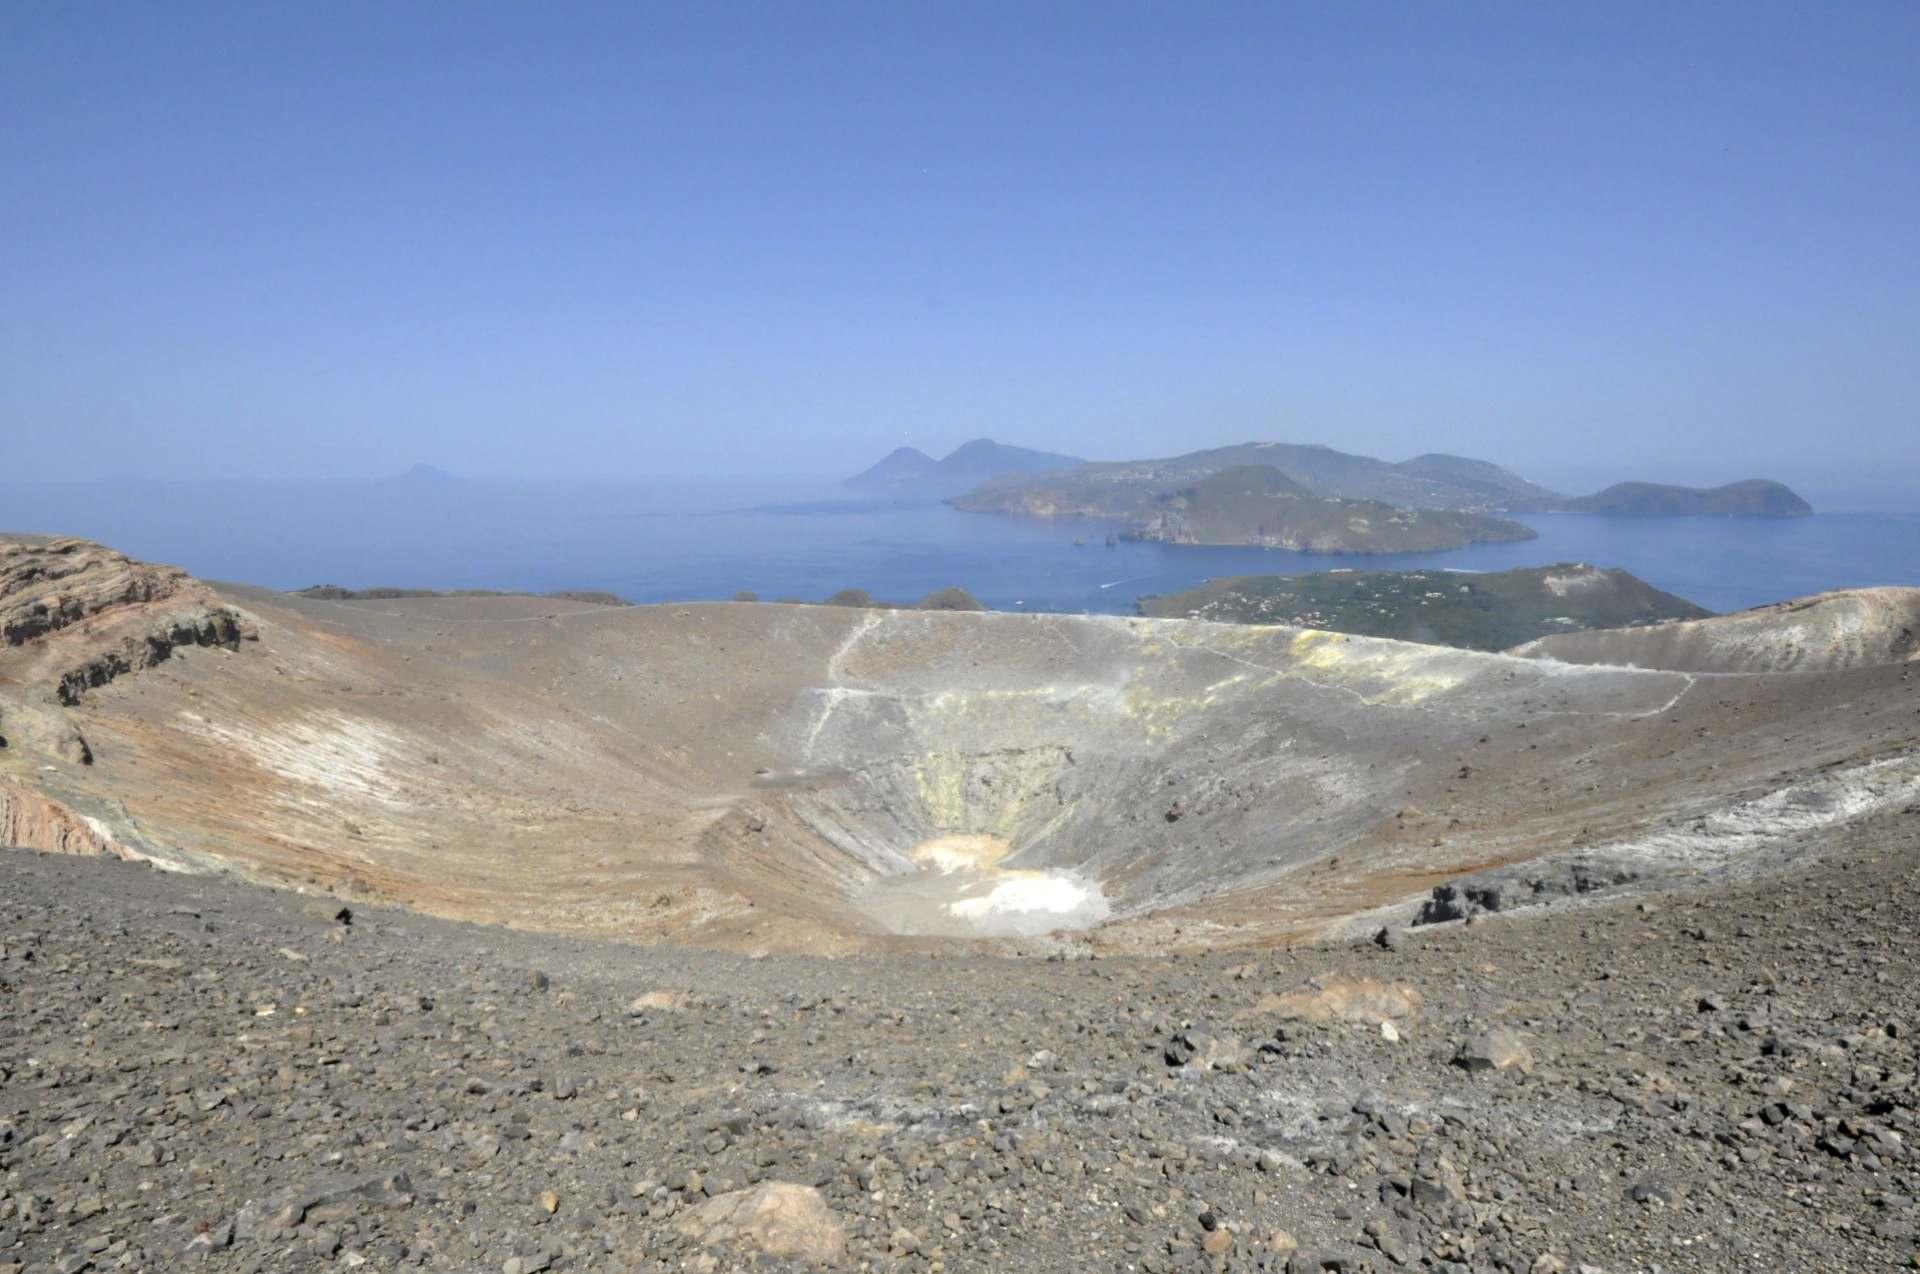 The caldera of vulcano